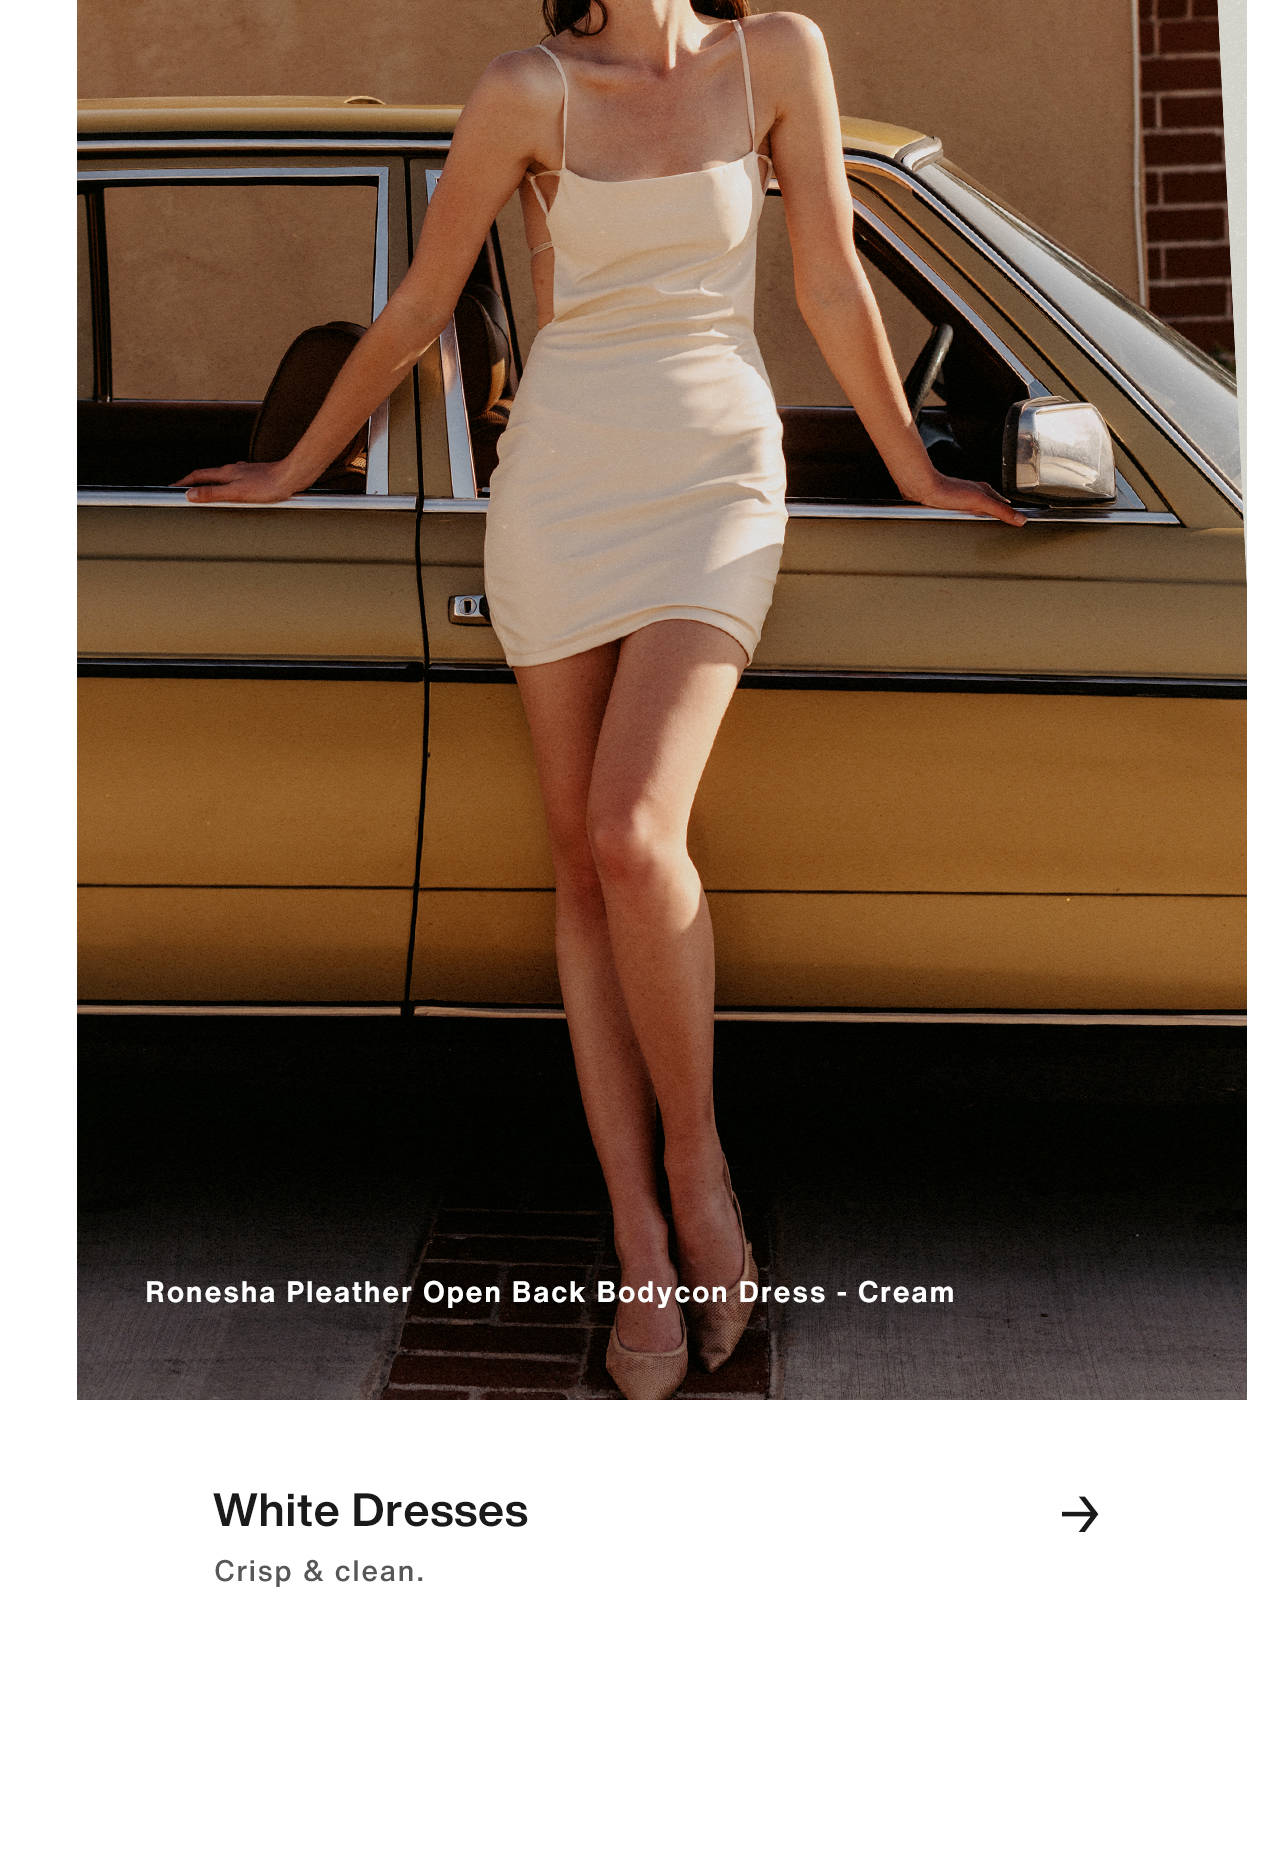 White Dresses - Classic & crisp.